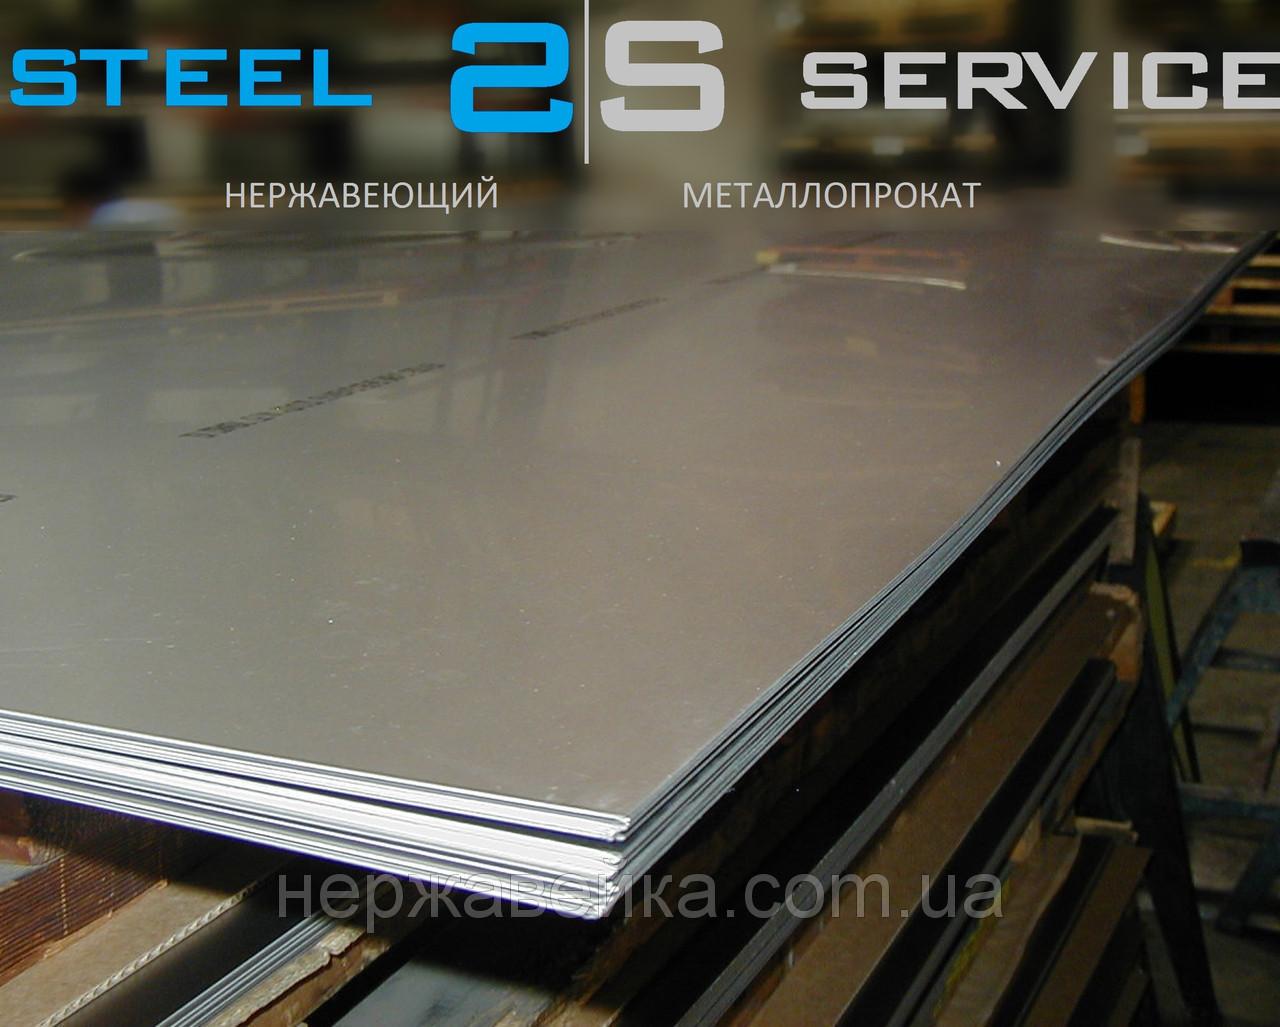 Нержавеющий лист 4х1250х2500мм AISI 430(12Х17) 2B - матовый, технический